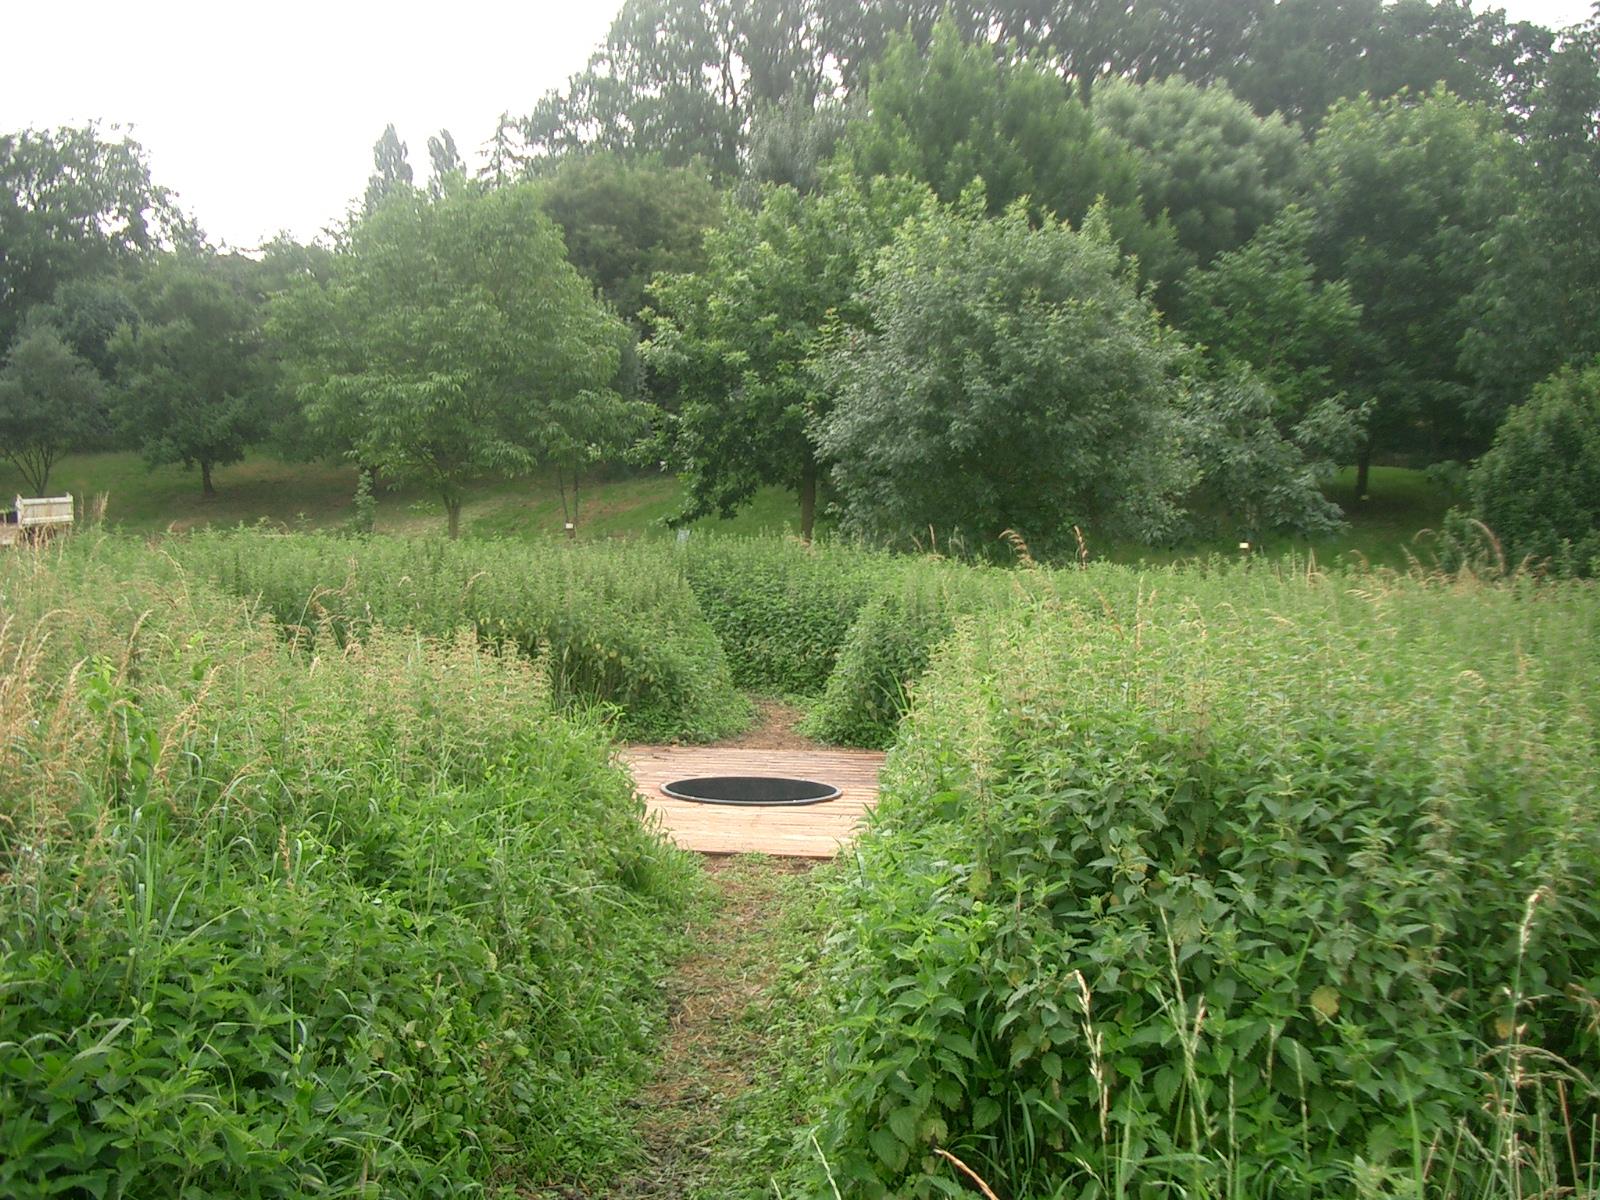 Prog res frames articoli il movimento del giardino - Giardino francese ...